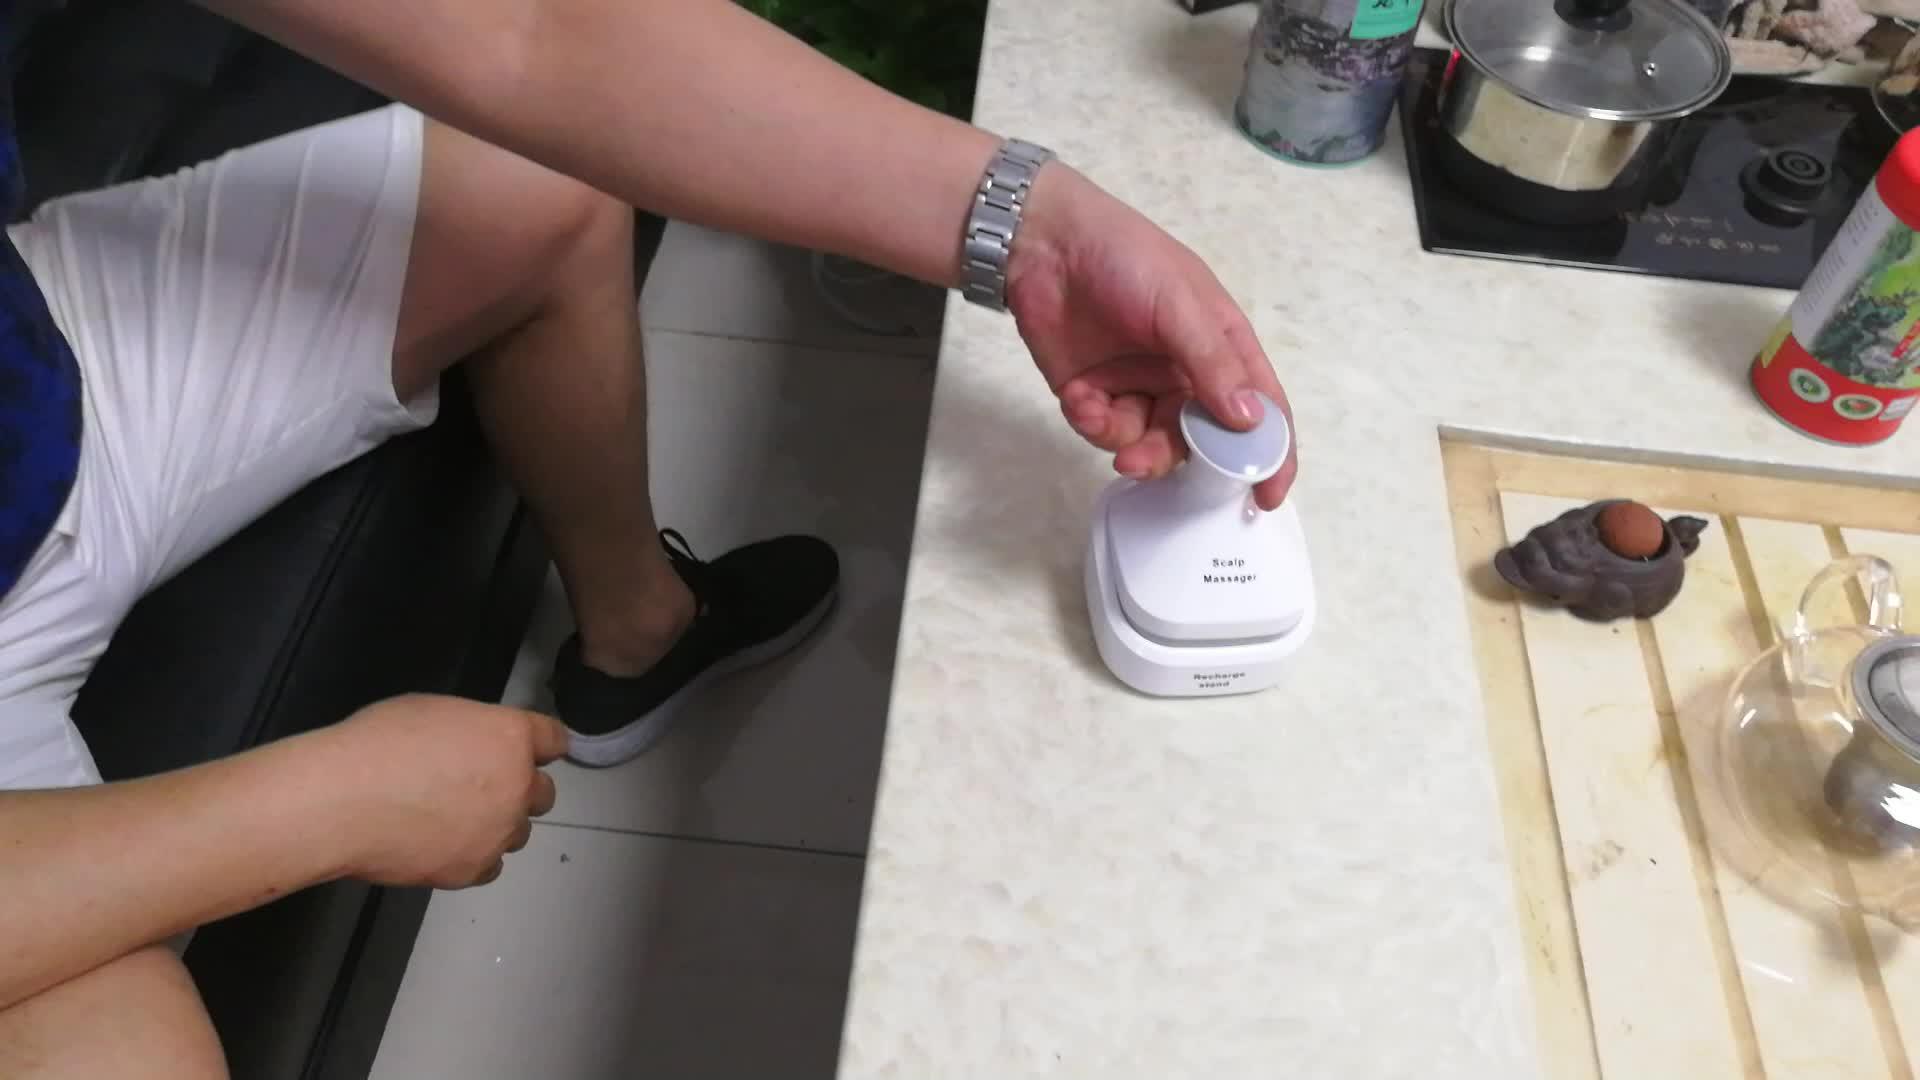 Misida Skin Friendly SiliconGel Disassemble and Washable Multi-directional Rotation 10 Min Auto Shutdown Kneading Head Massager